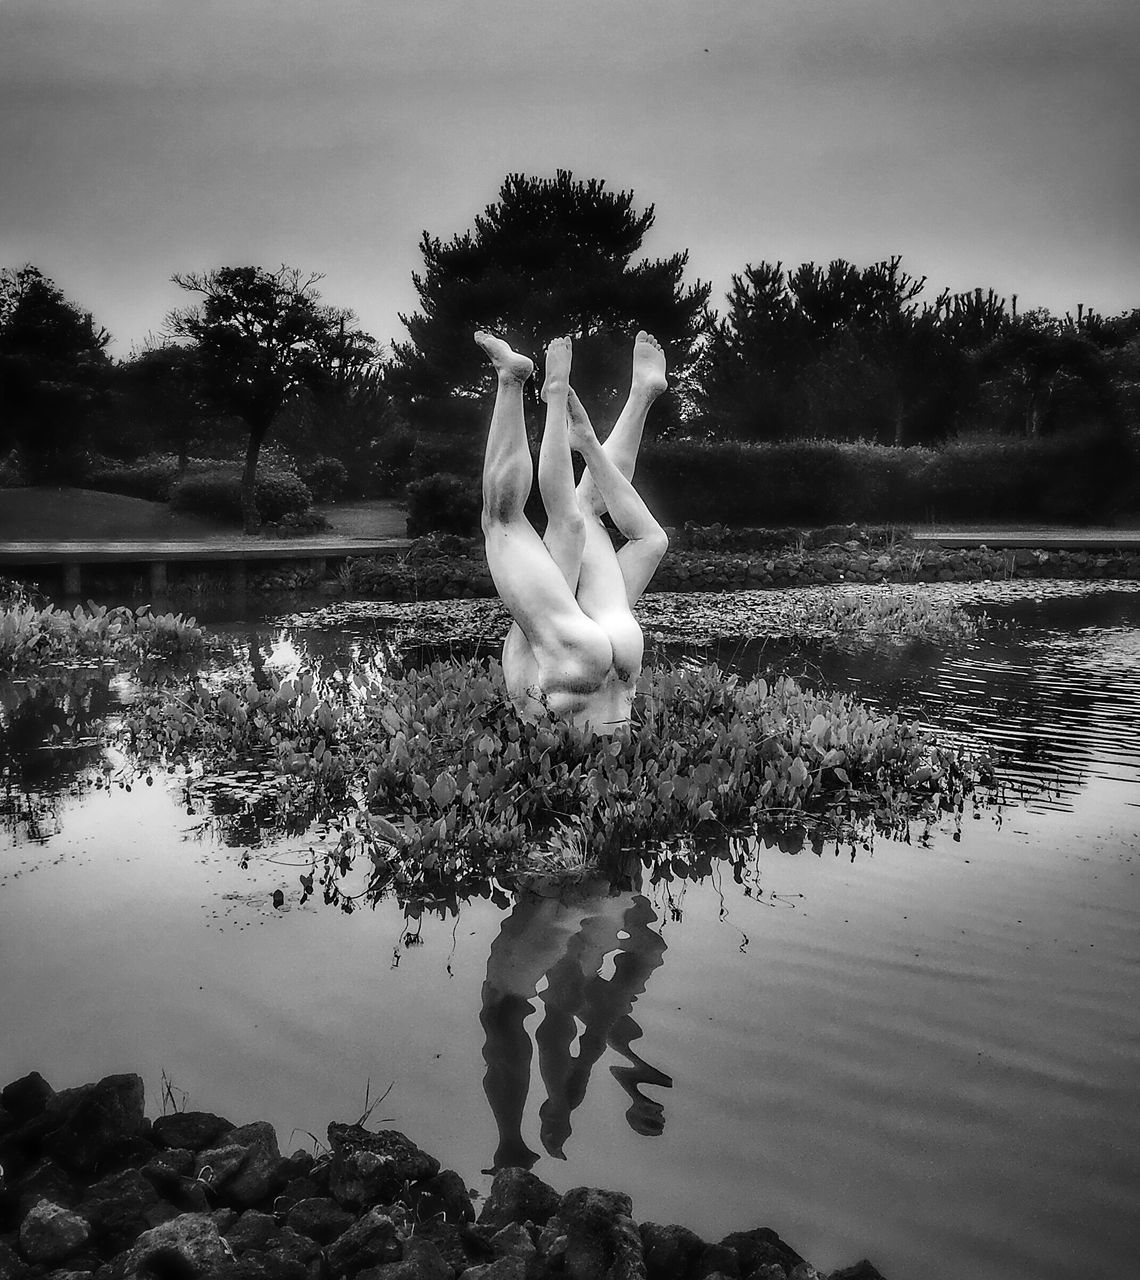 SWAN STANDING ON LAKE AGAINST SKY